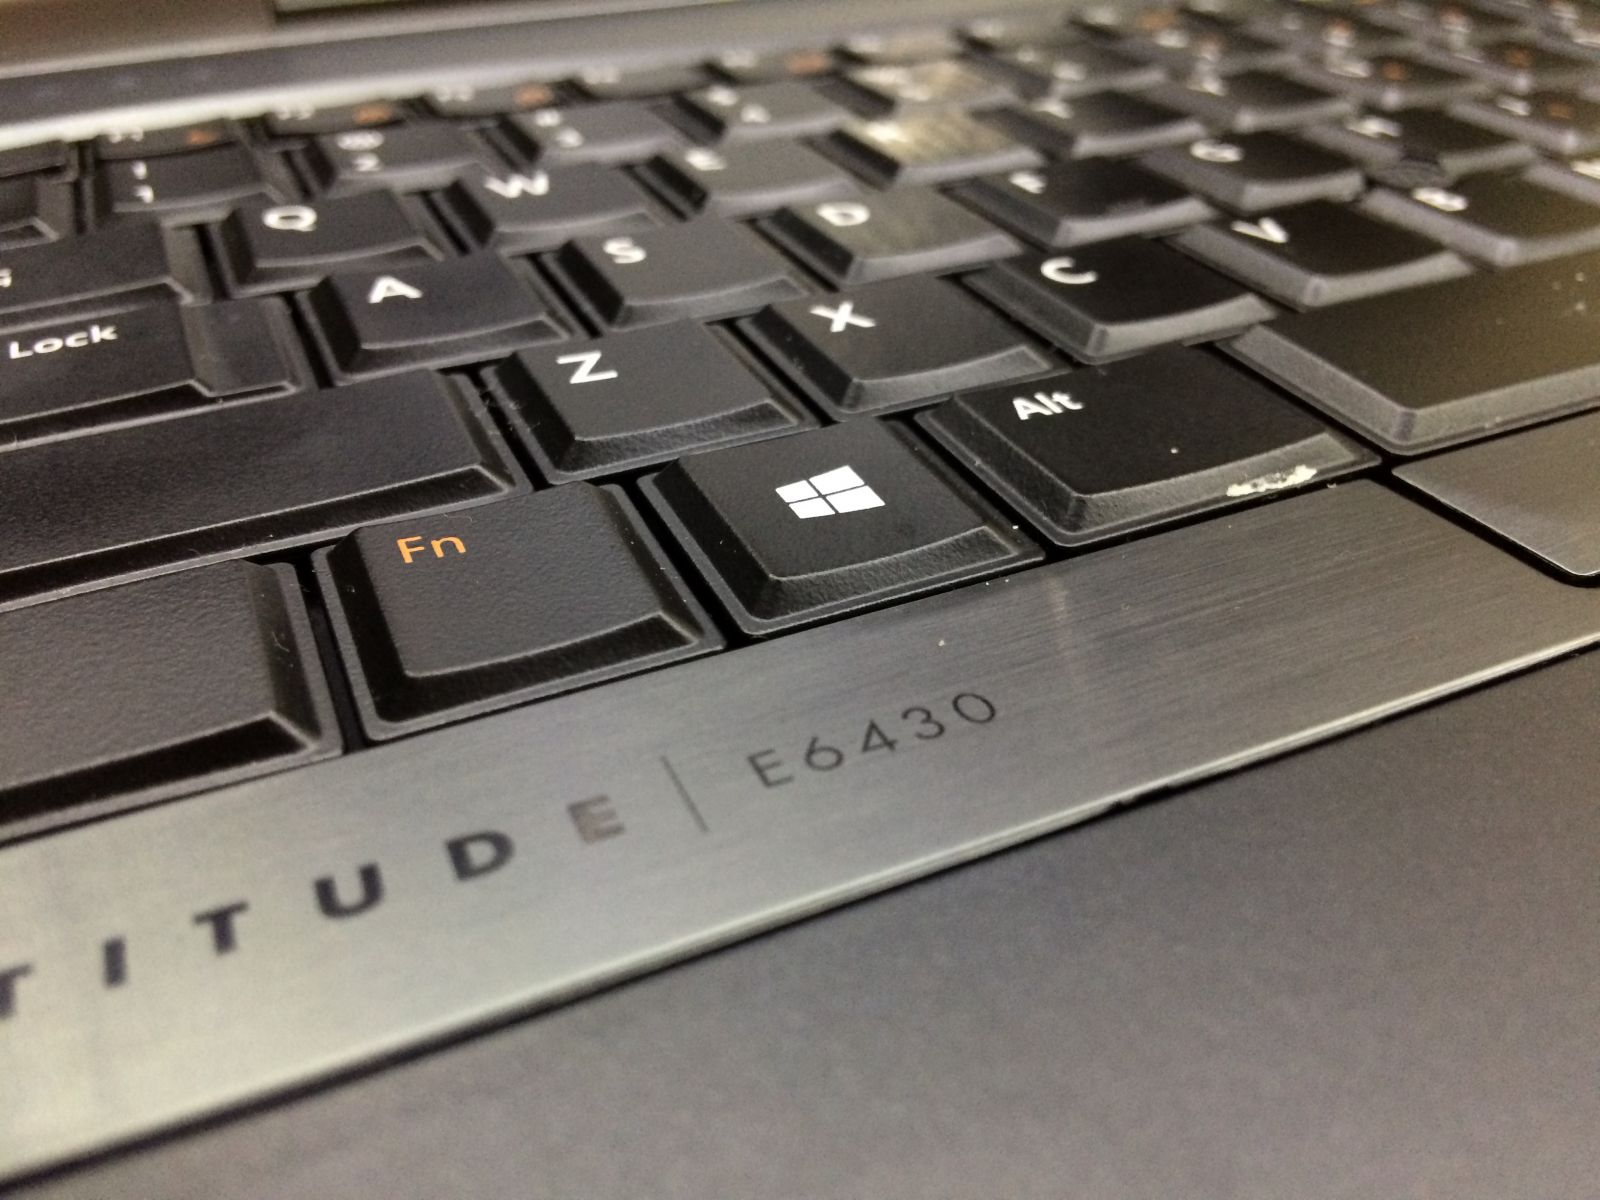 DELL LATITUDE E6430 I5 VGA RỜI (i5 3310M 2.6 GHz, ram 4gb, ssd 120gb, 14 inch)